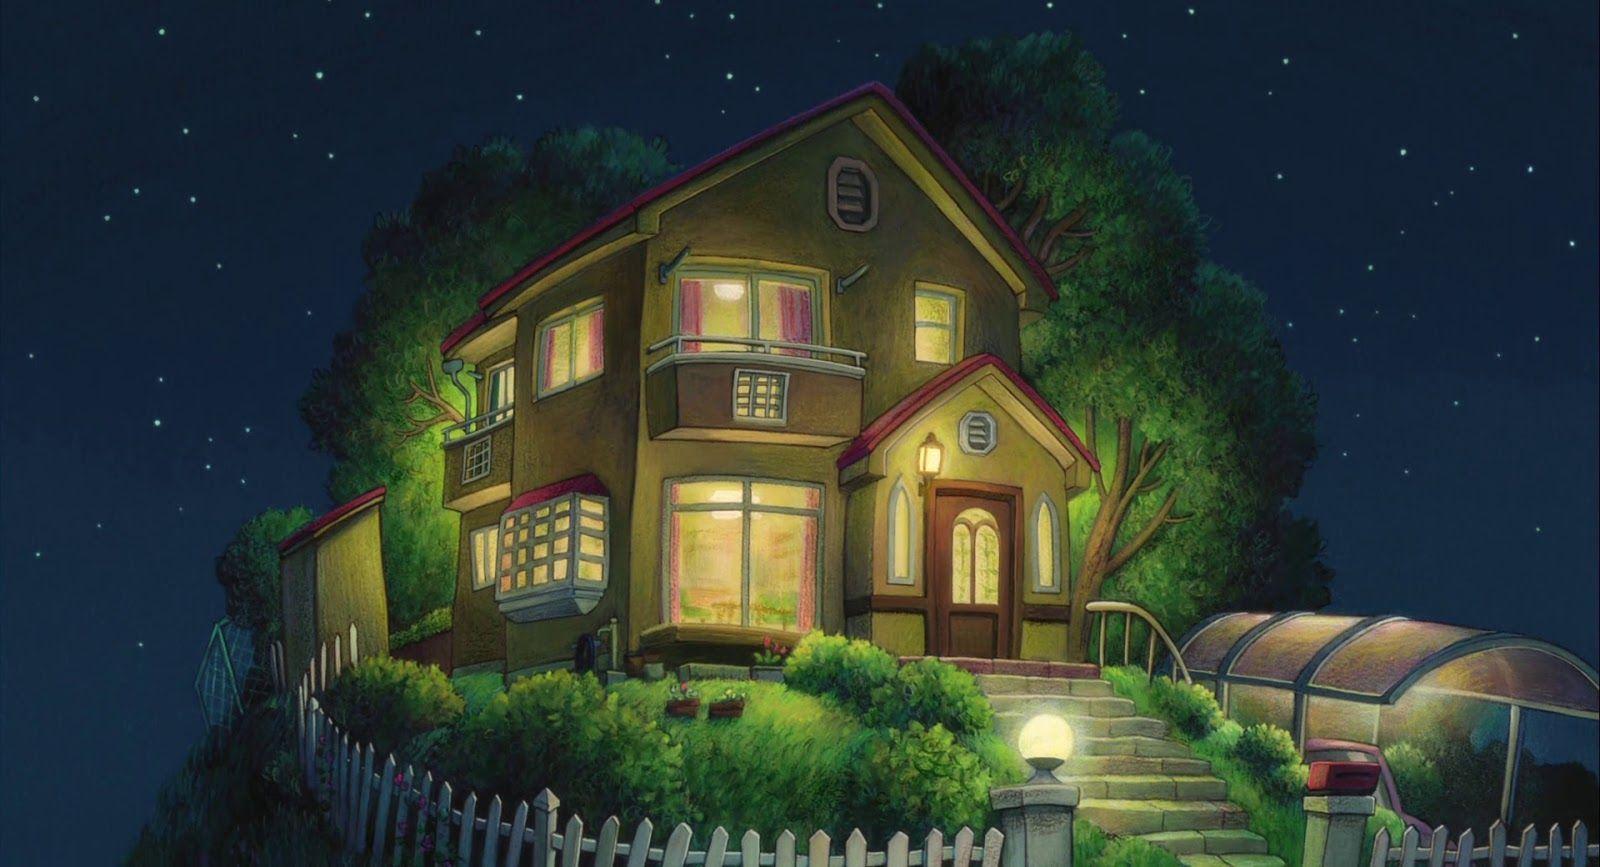 House From The Movie Ponyo Ghibli Anime Background 家 絵 スタジオジブリ ファンタジーハウス